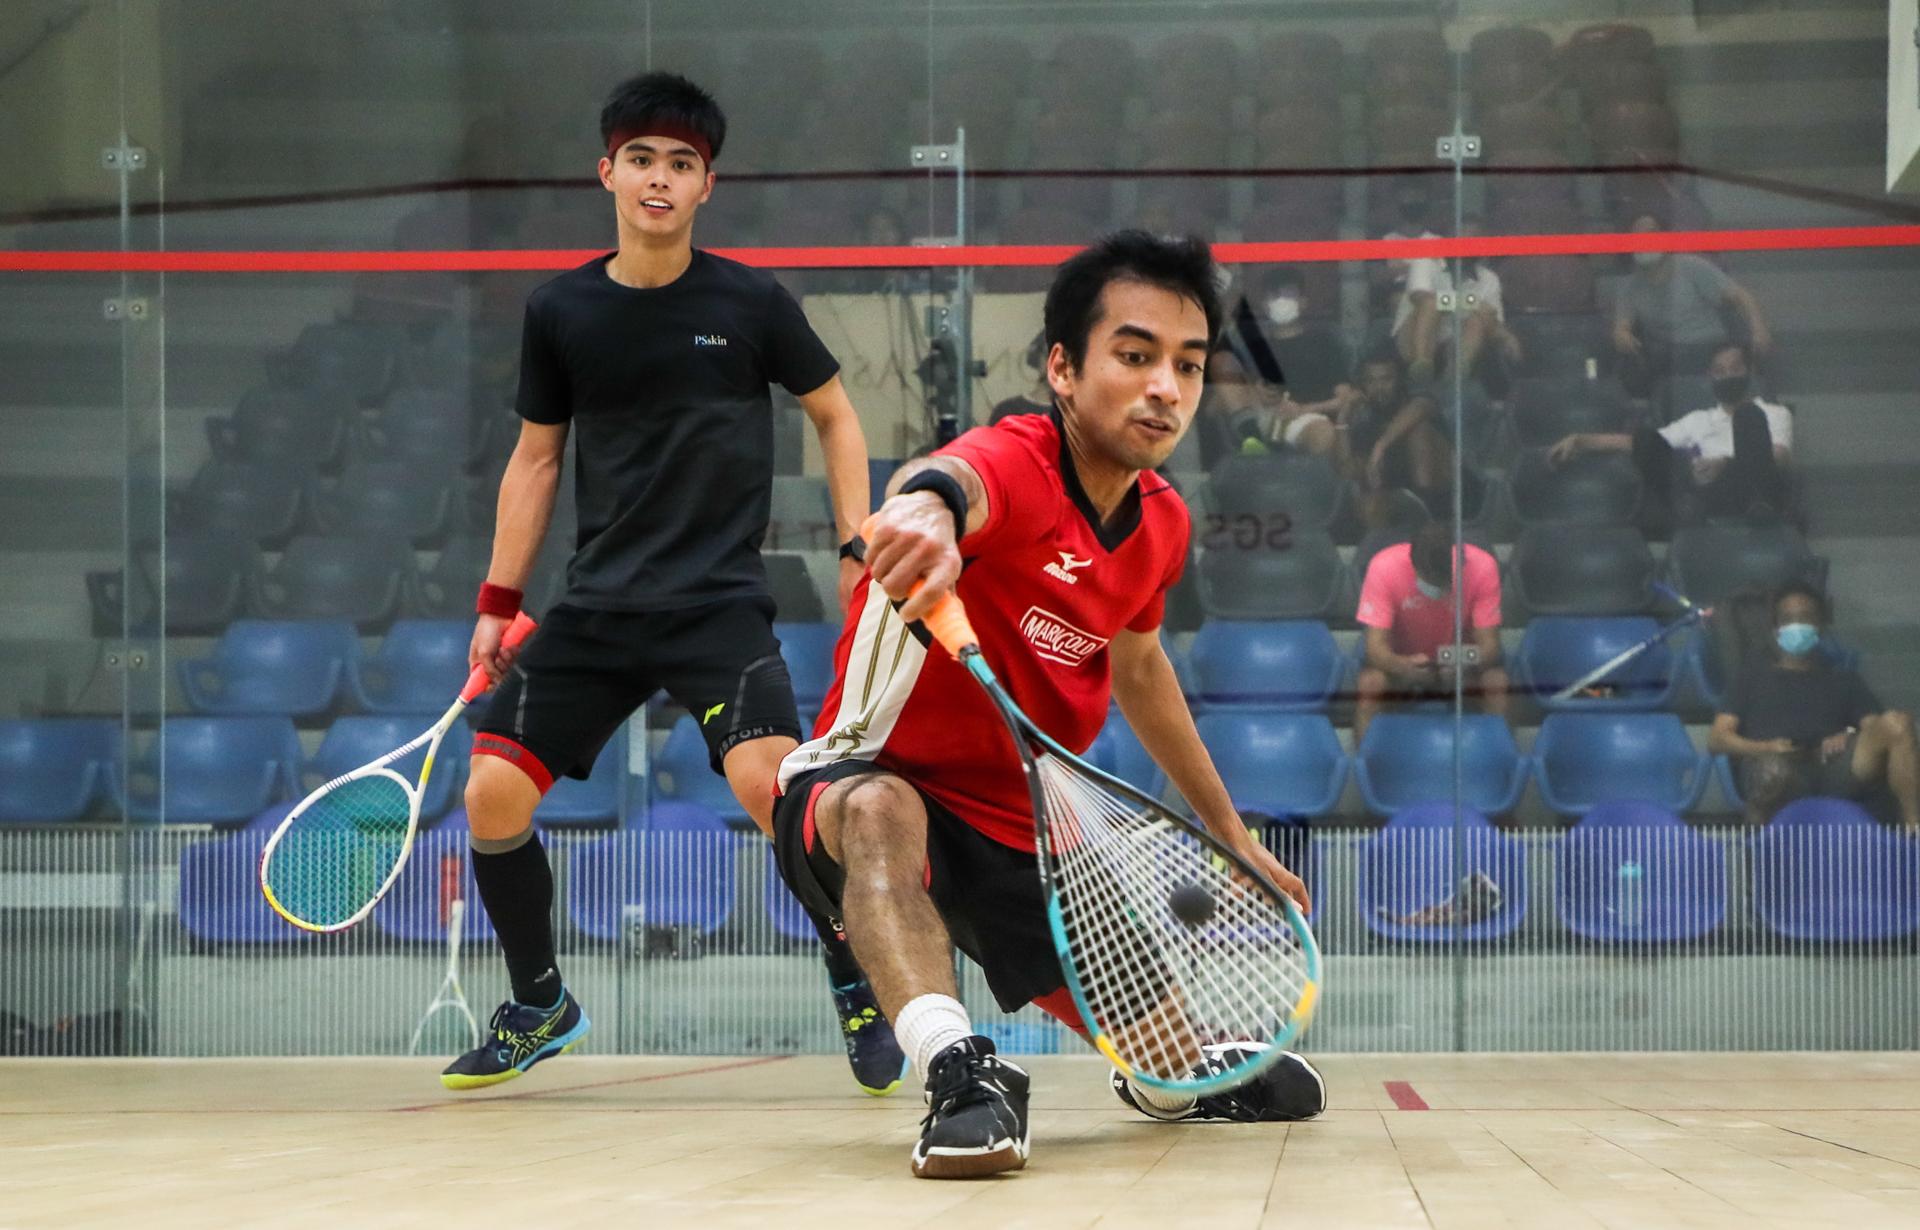 Samuel Kang winsDYMON Asia SGSquash circuit #1 main event, to kick off the annual squash season